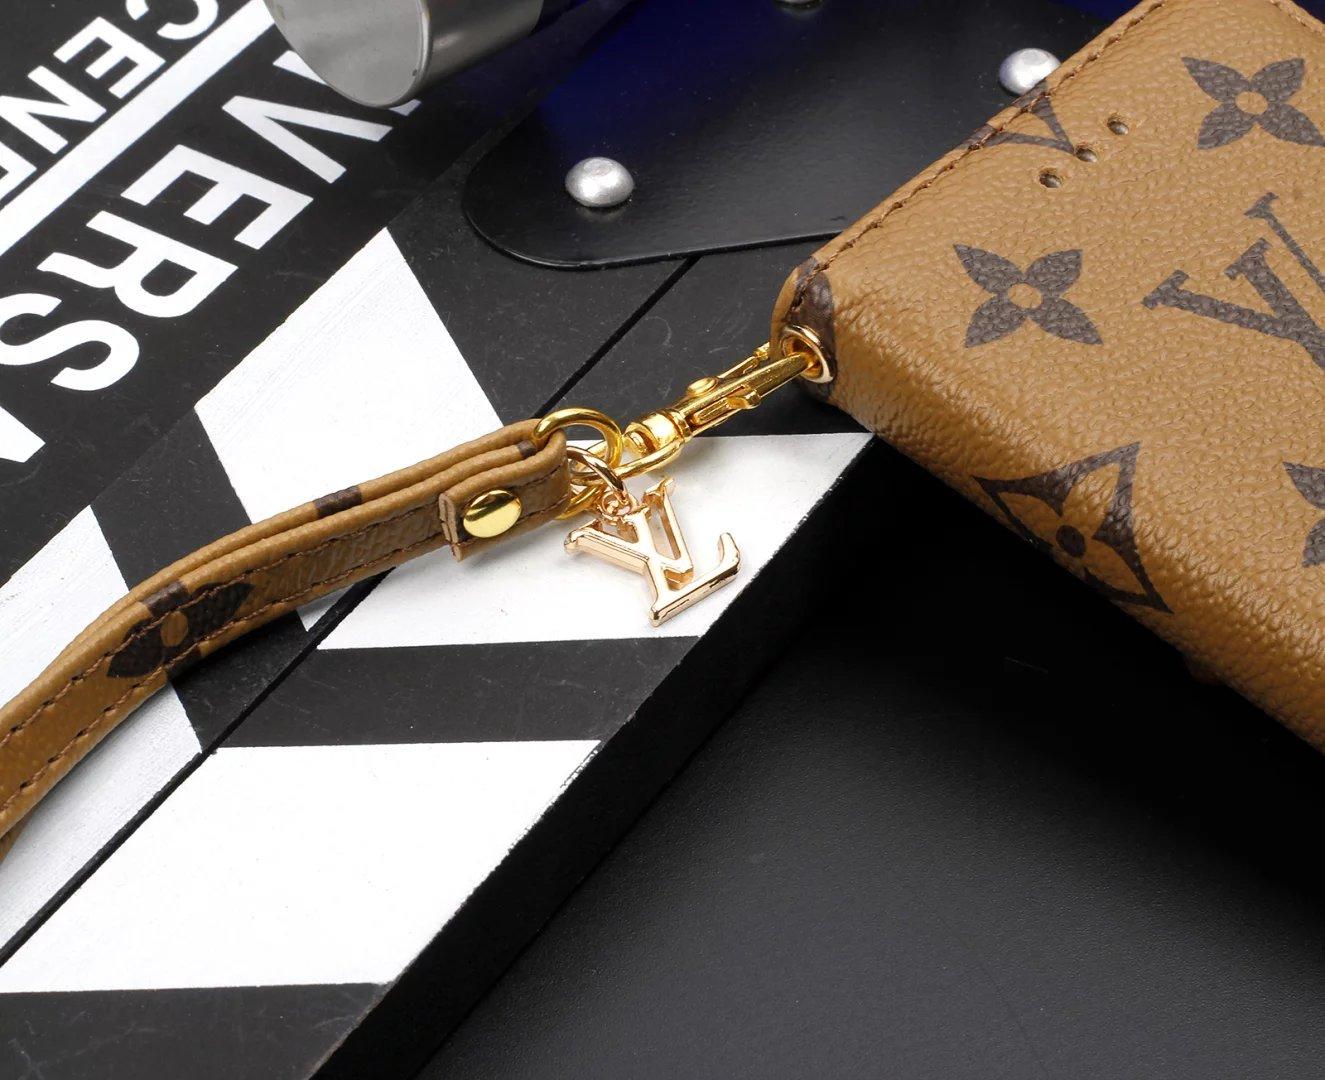 iphone klapphülle iphone hülle bedrucken lassen Louis Vuitton iphone7 hülle leder handyhülle iphone 7 kamera iphone 7 iphone display iphone 7 holz hülle handyschale foto handy hardcover 7lbst gestalten